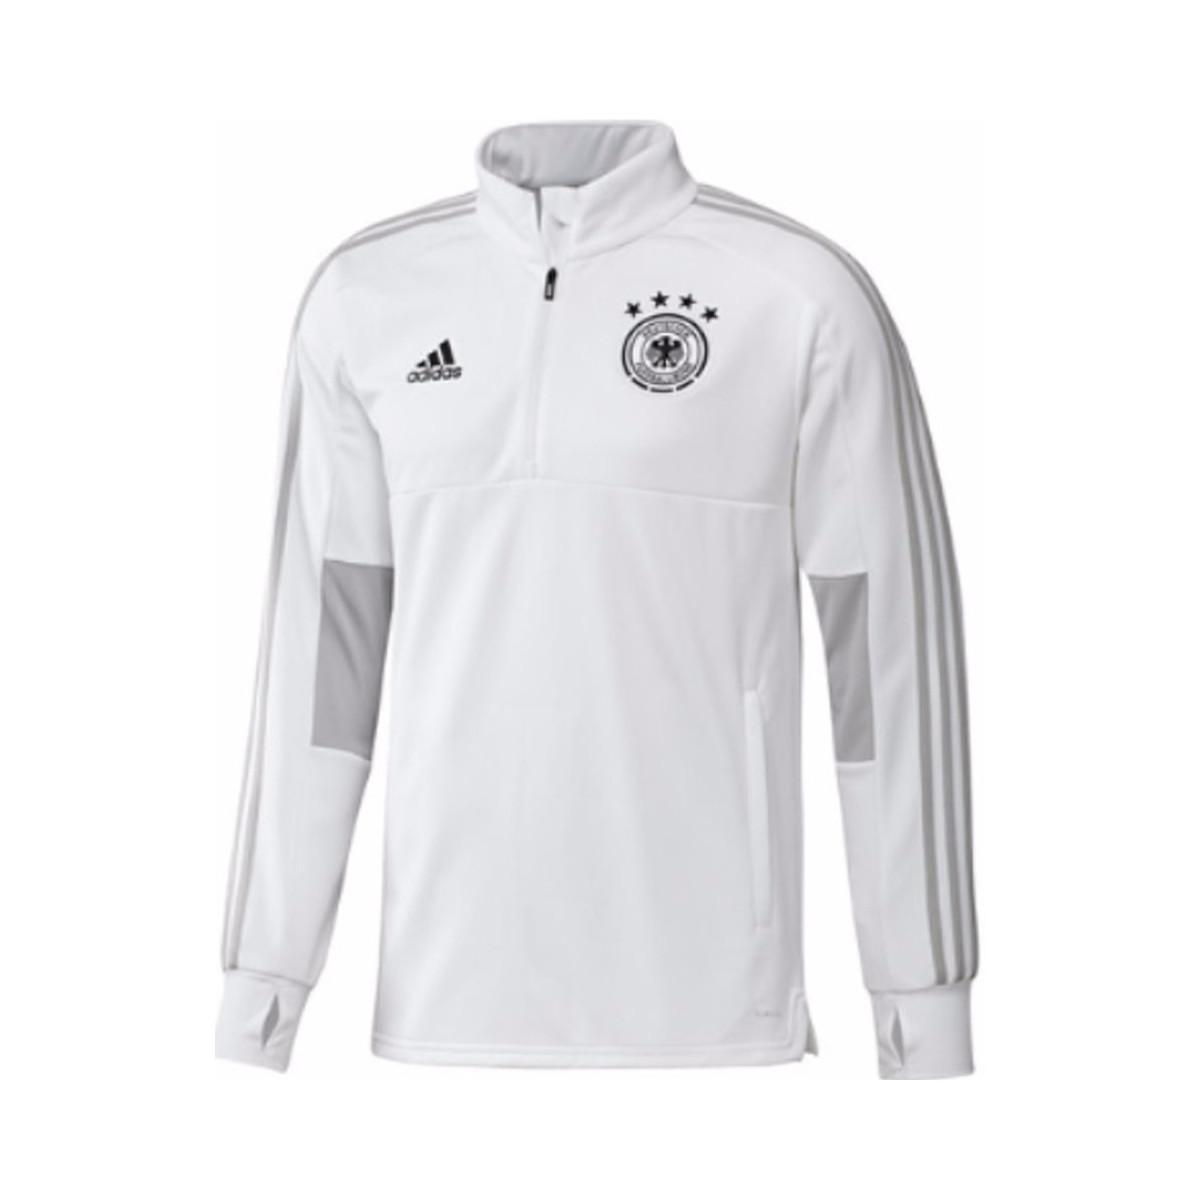 e3efd3e55 adidas 2018-2019 Germany Training Top - Kids Men s Sweatshirt In ...